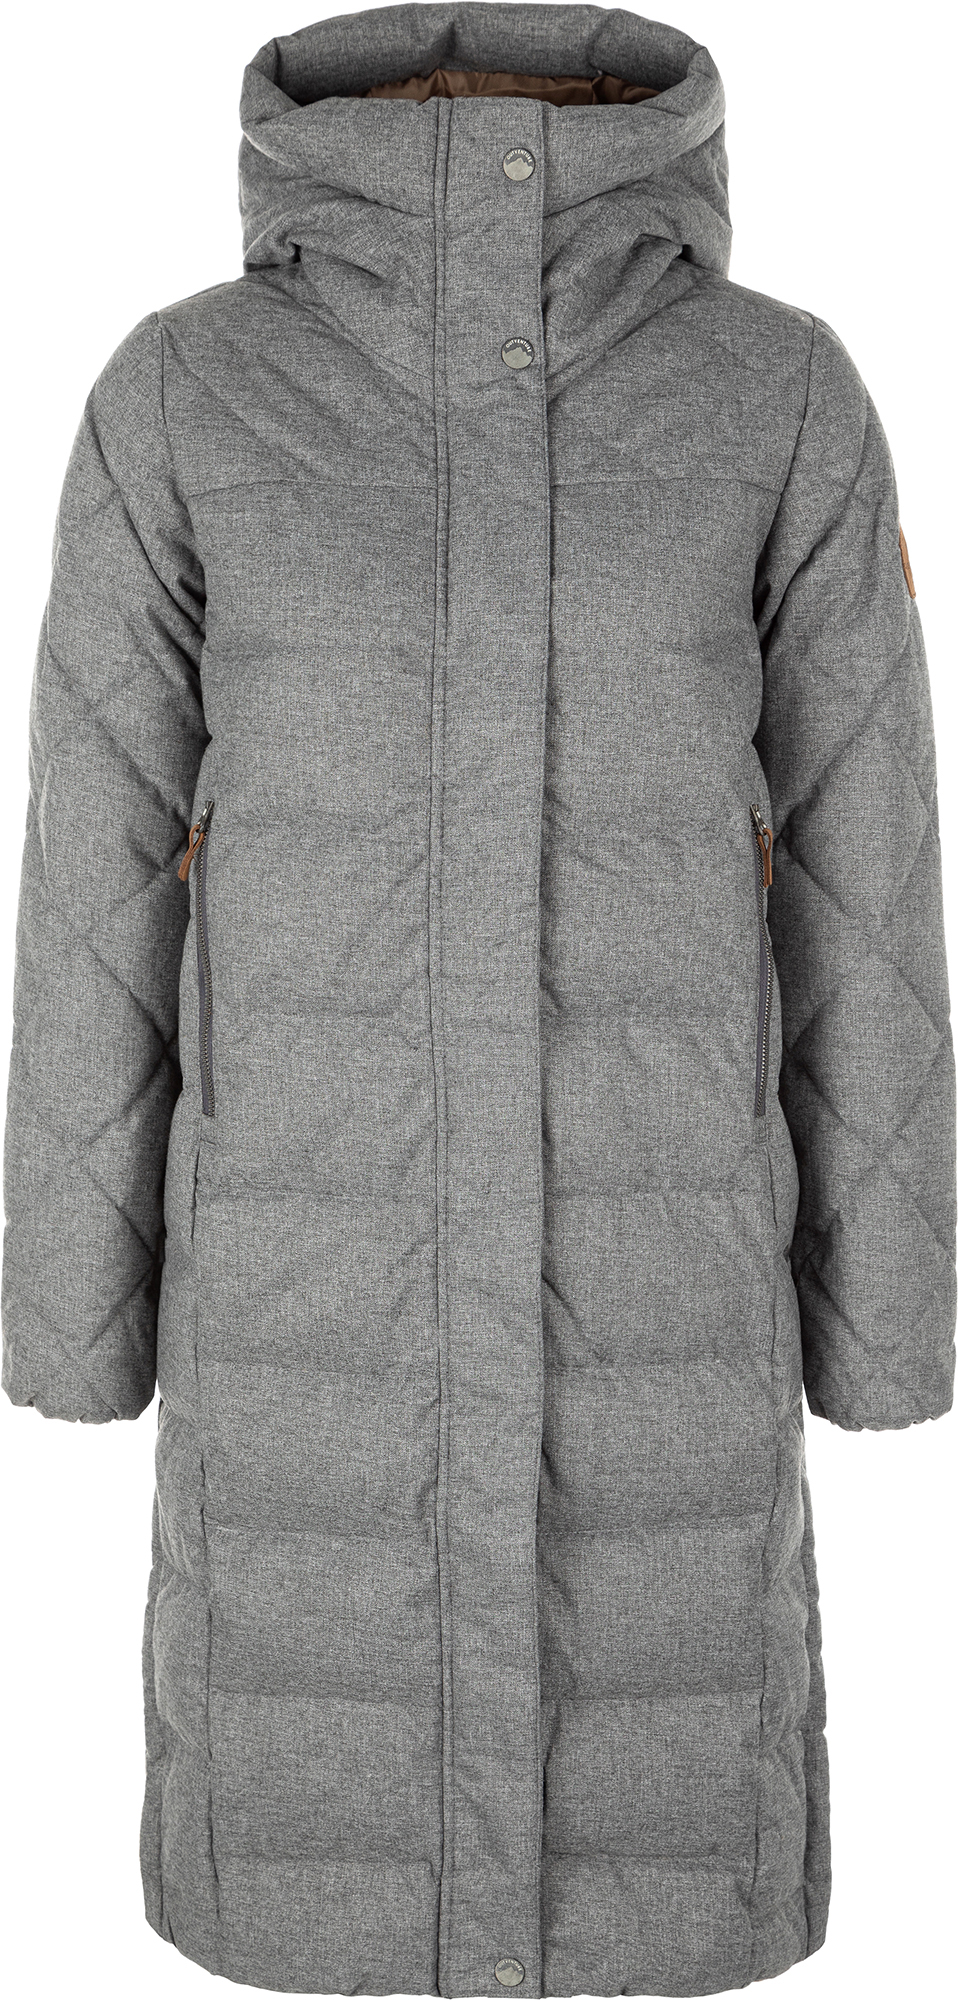 Outventure Куртка пуховая женская Outventure, размер 52